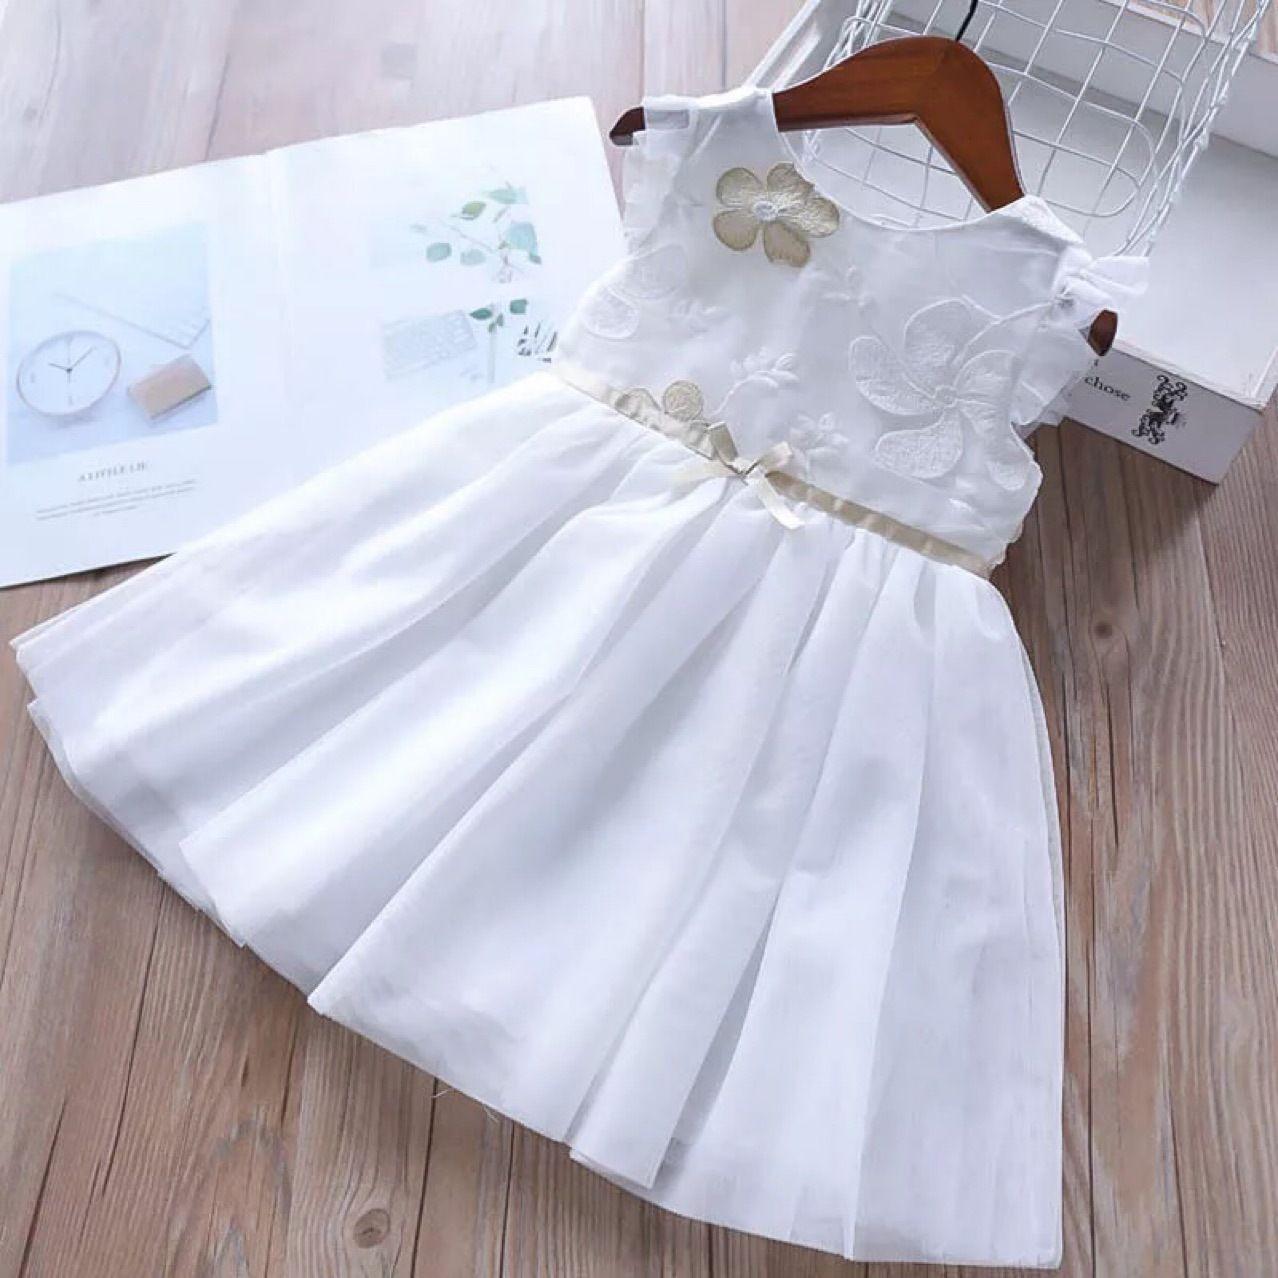 2019 Girl Embroidery Flower Dresses 2019 Summer Kids Clothing ... 1d8927dfd450